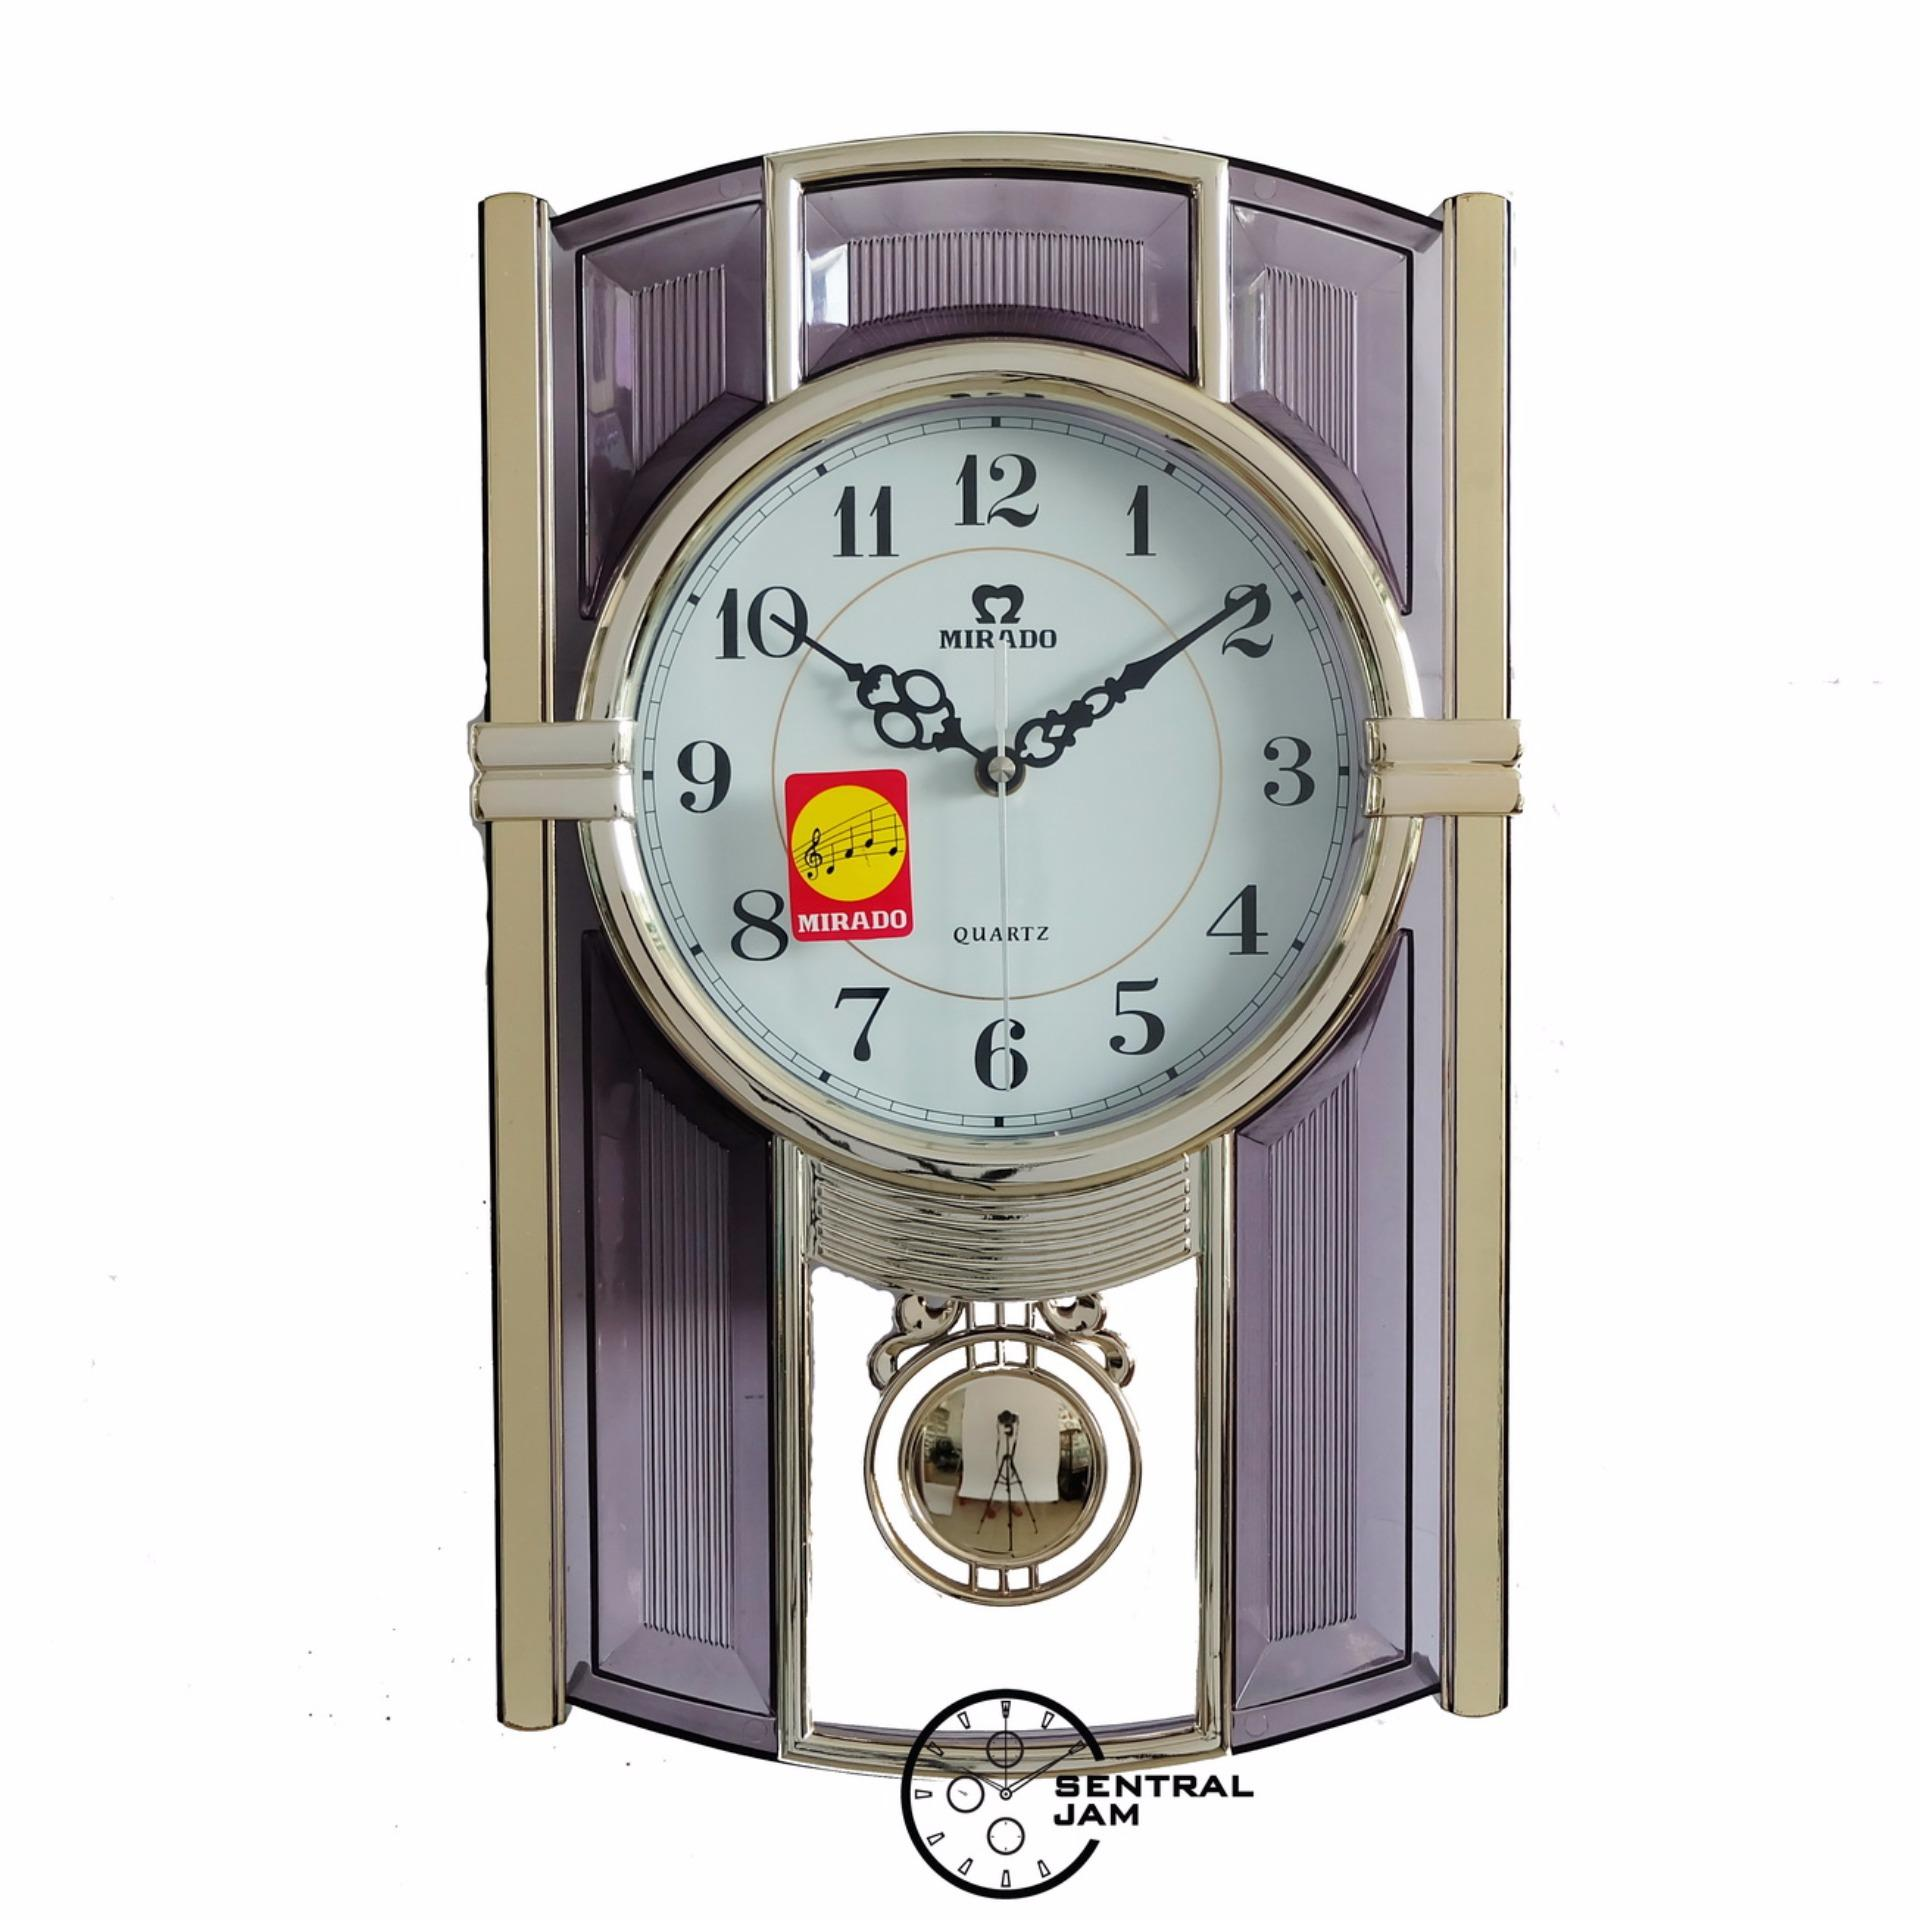 Ikea Dekad Alarm Clock Silent Clock Desain Vintage Hitam - Page 4 - Daftar Update Harga